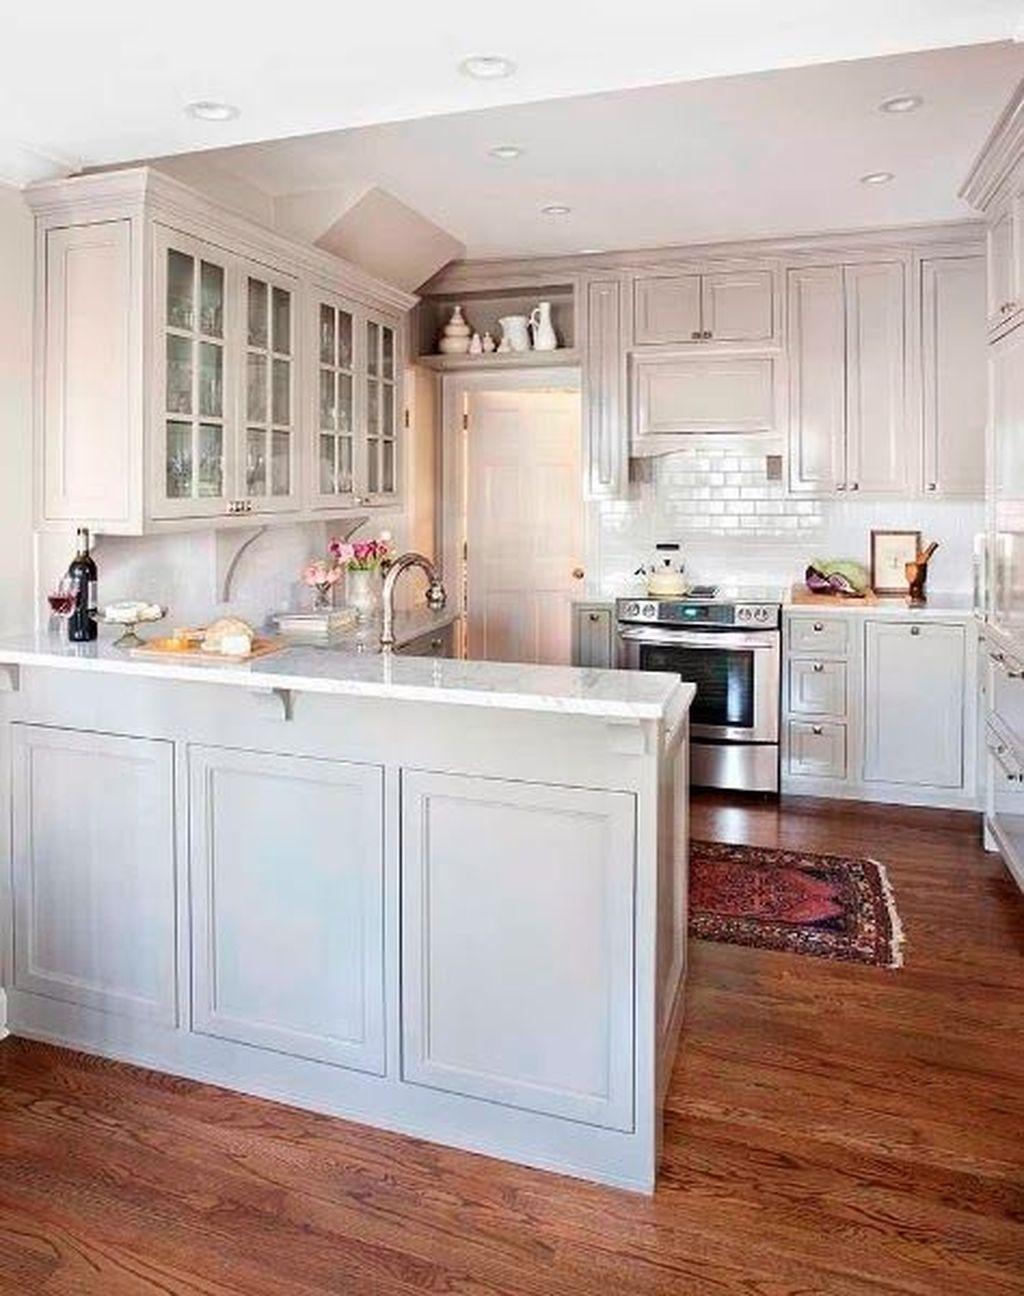 20 elegant small white kitchen design ideas in 2020 home kitchens kitchen design shaker on kitchen ideas elegant id=41078